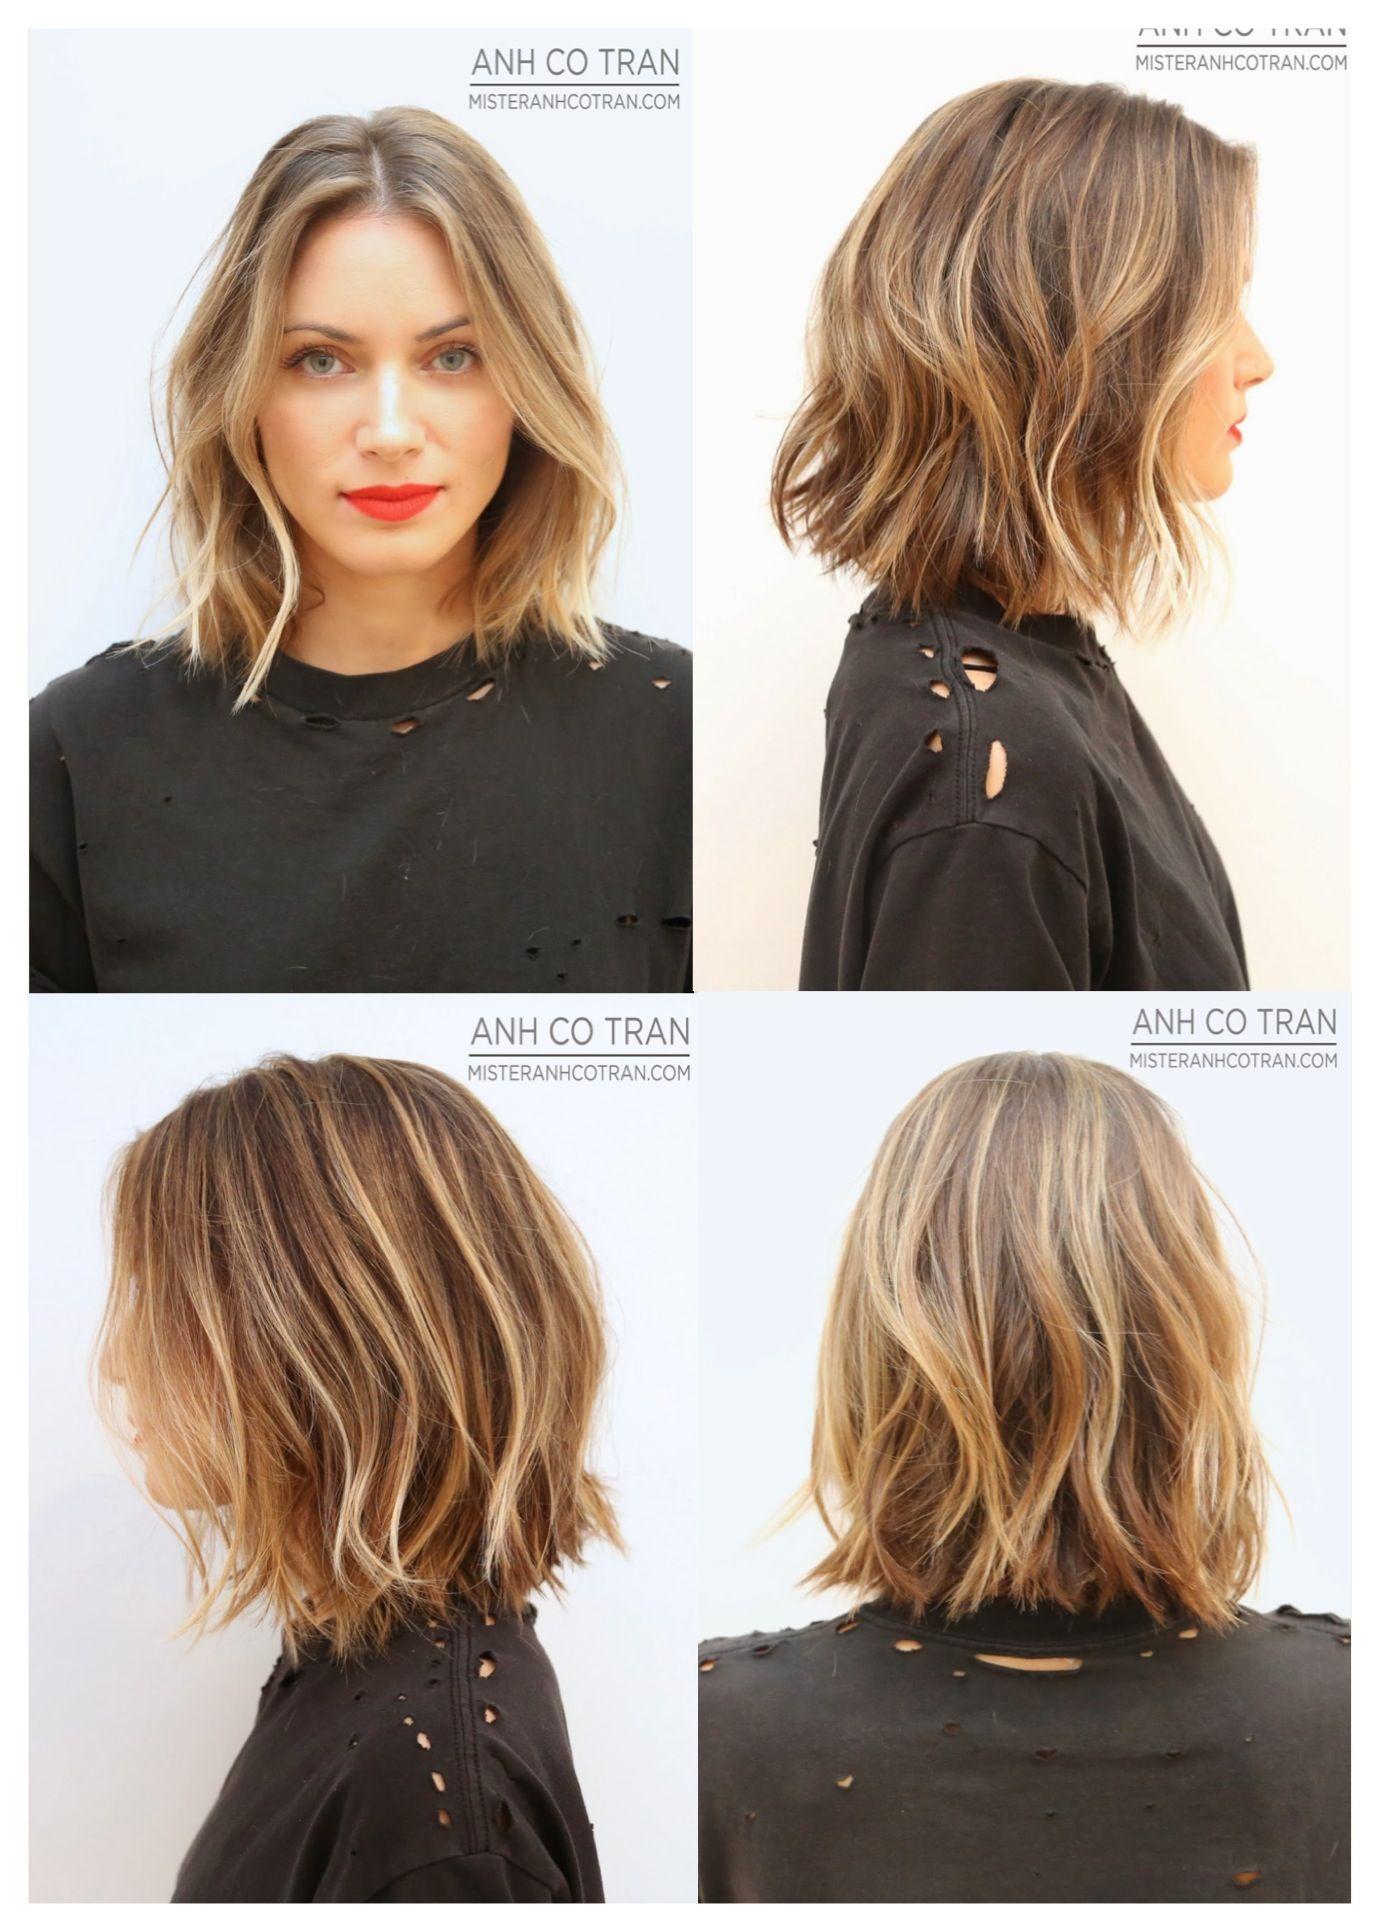 Pin By Sarina Braekmans On B E A U T Y Hair Styles Thick Hair Styles Short Hair Styles